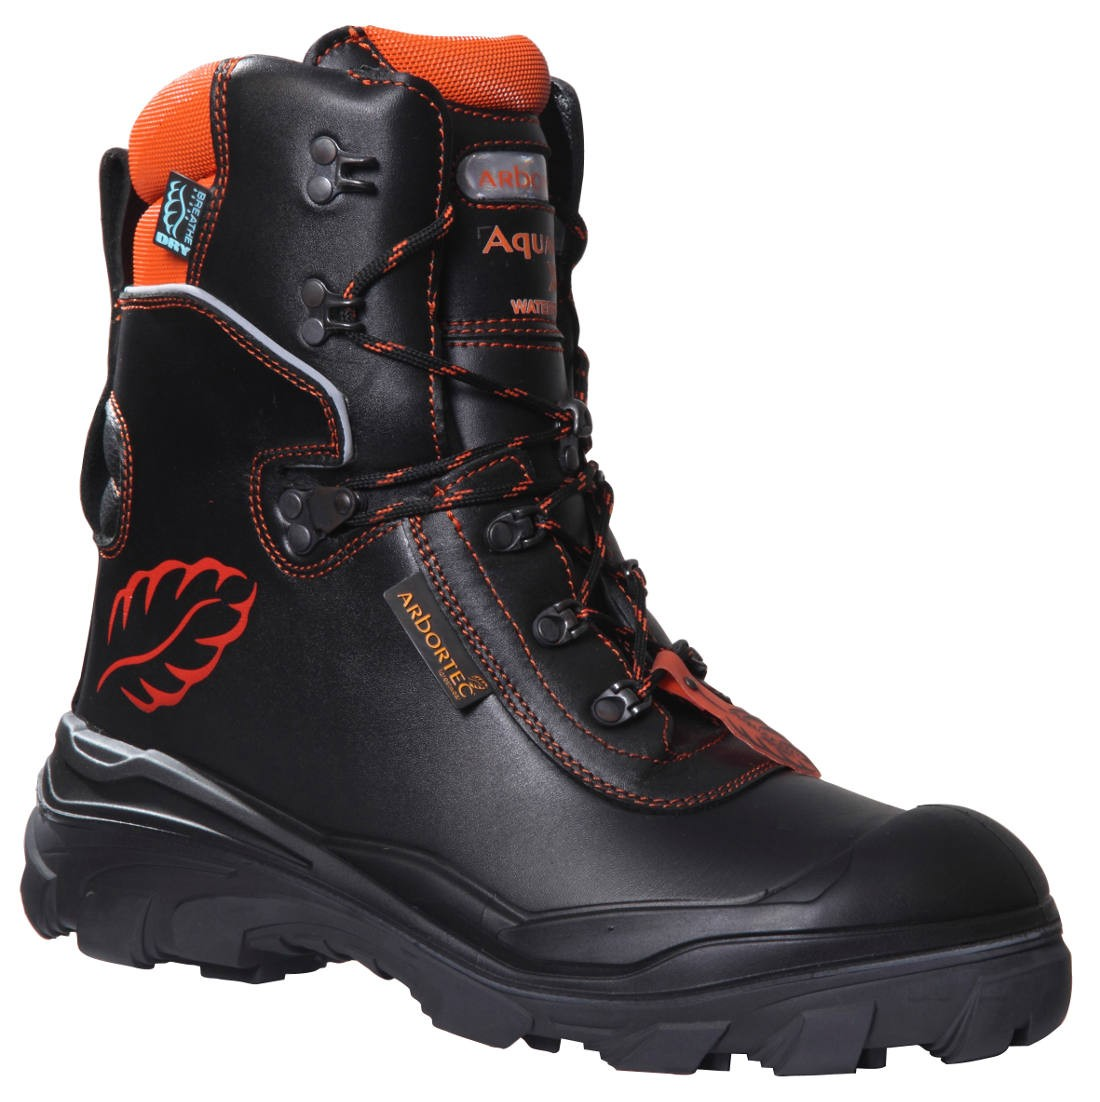 648341be30d Aquafell Xpert Class 2 Chainsaw Boot